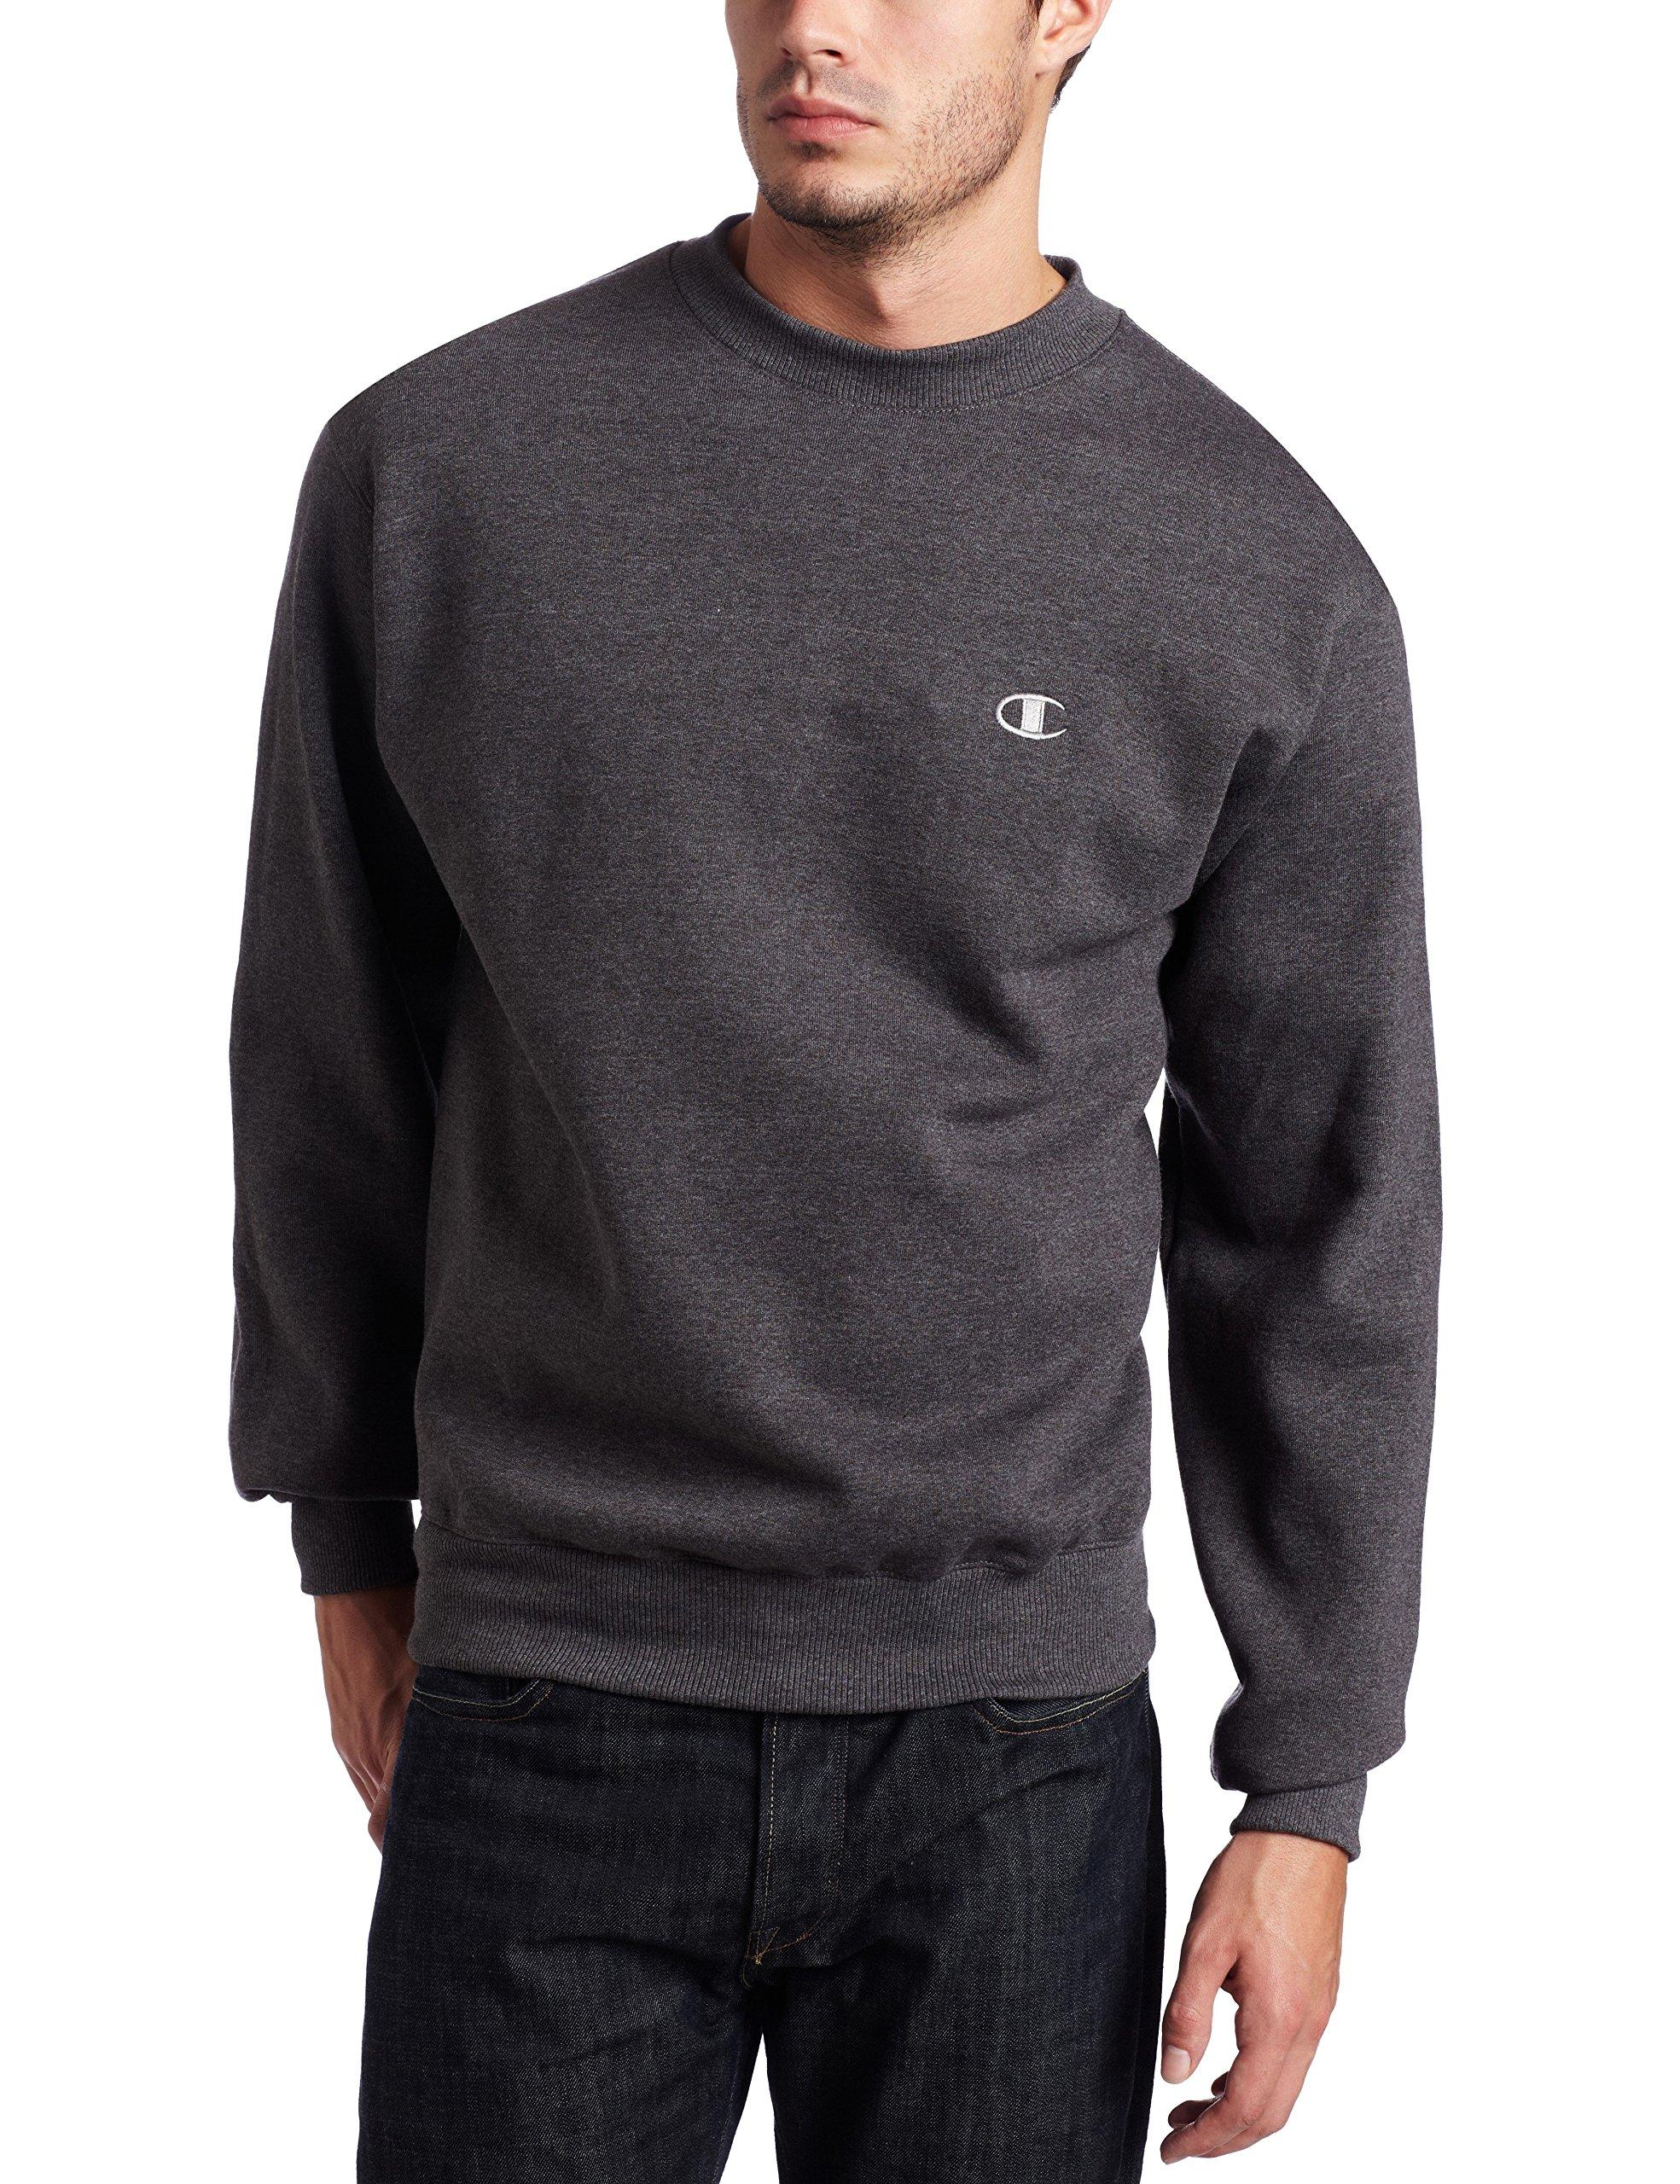 Champion Men's Pullover Eco Fleece Sweatshirt, Granite Heather, Large